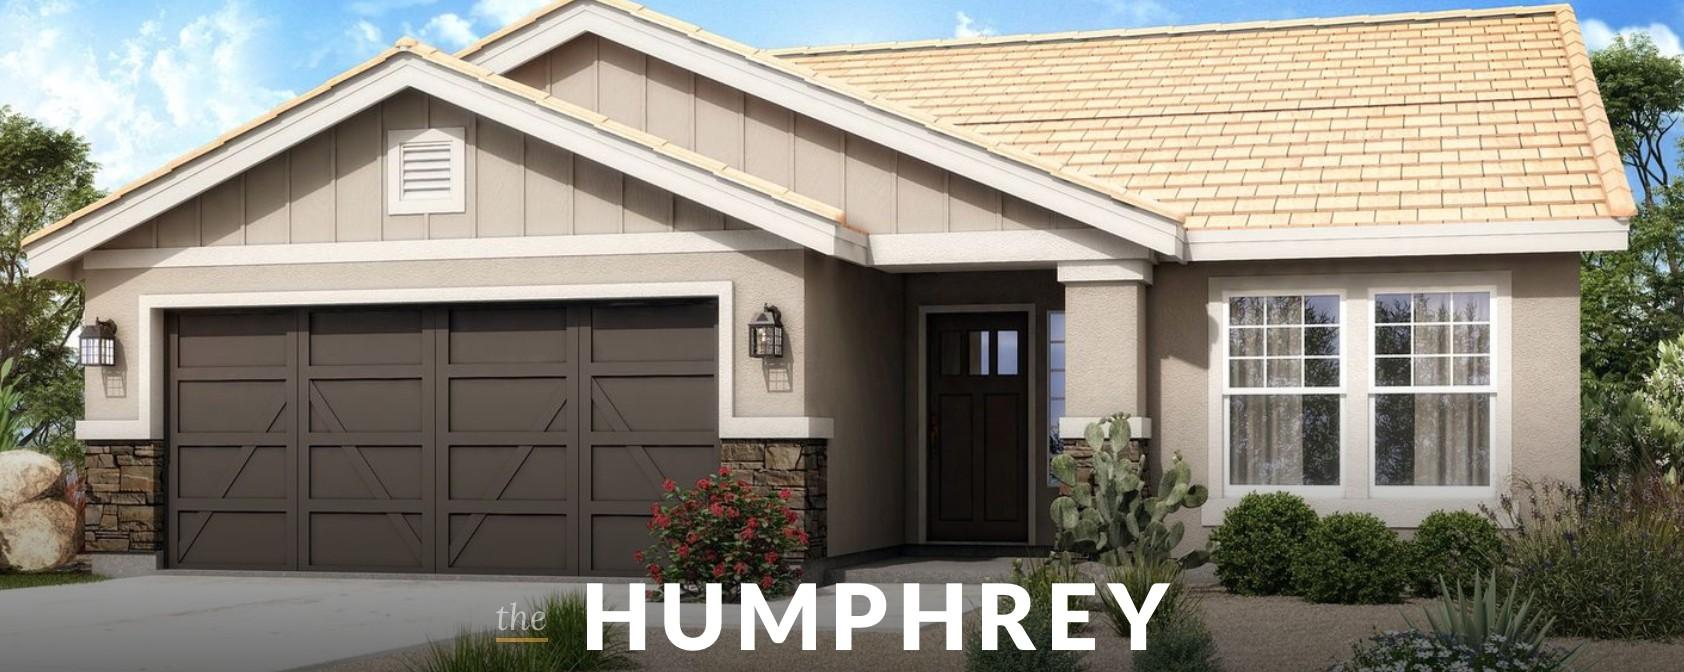 humphrey-floorplan